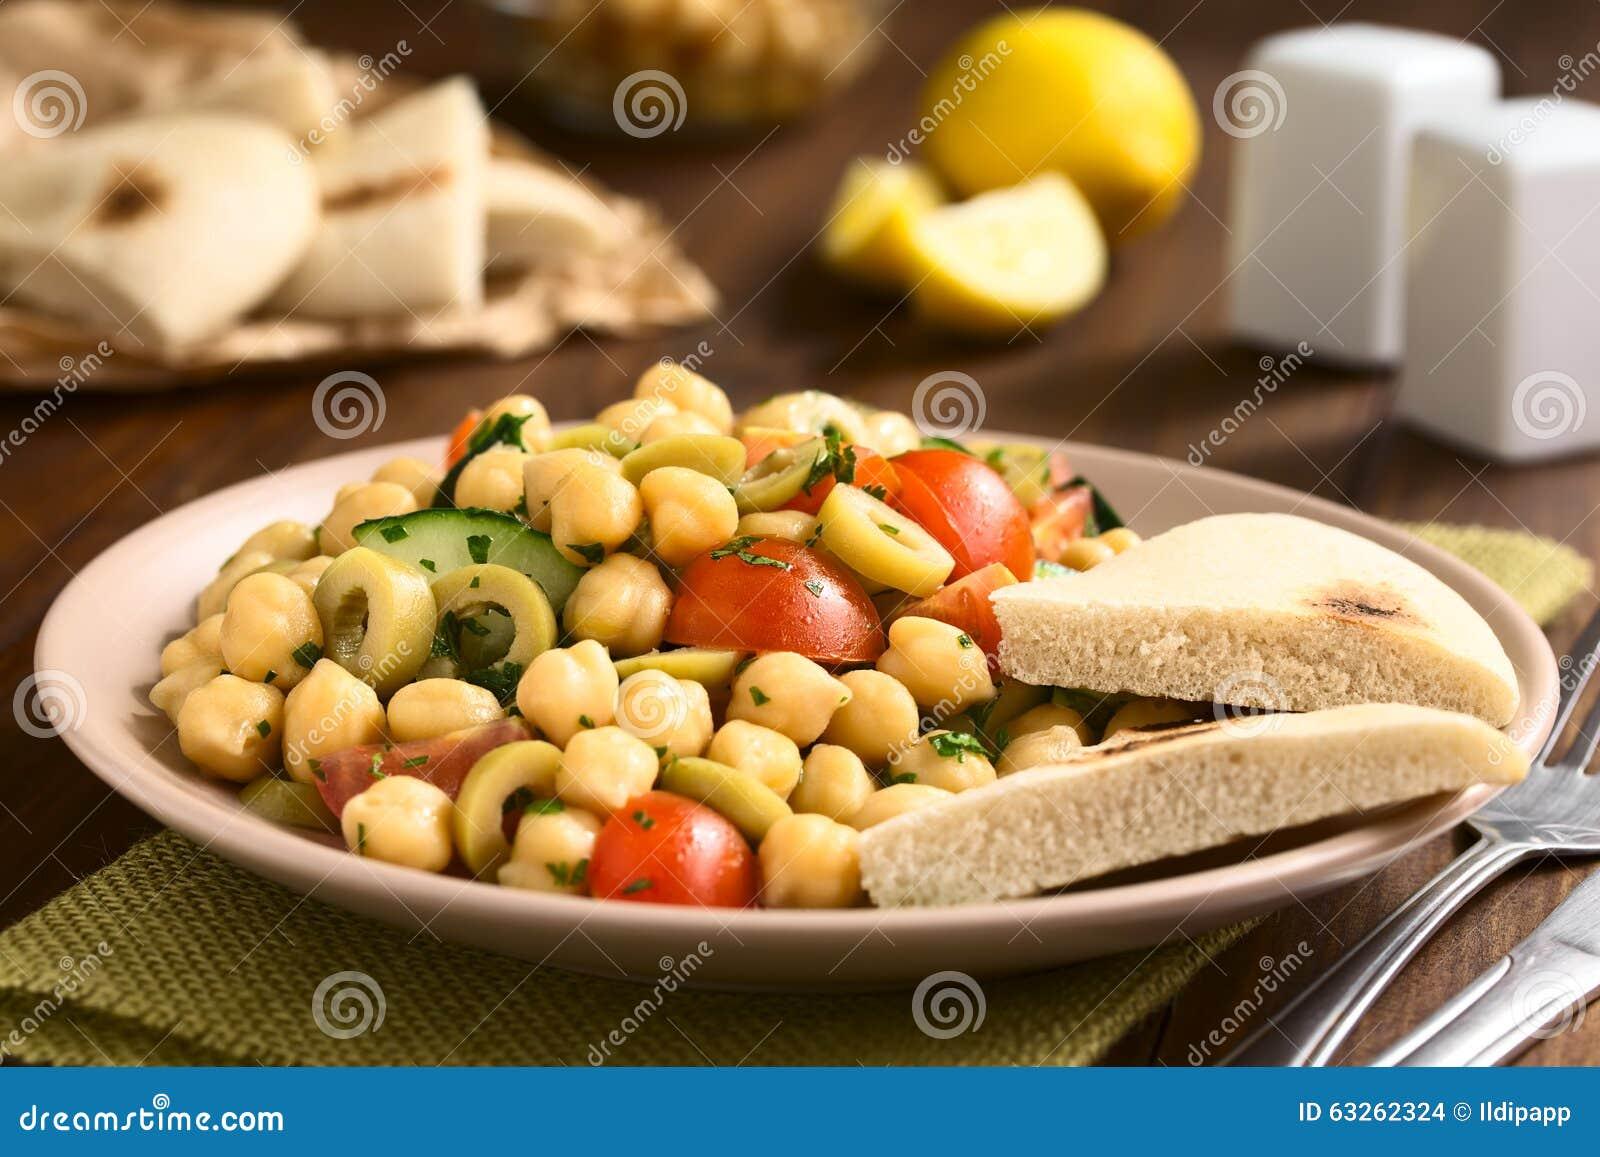 Chickpea Salad Stock Photo - Image: 63262324